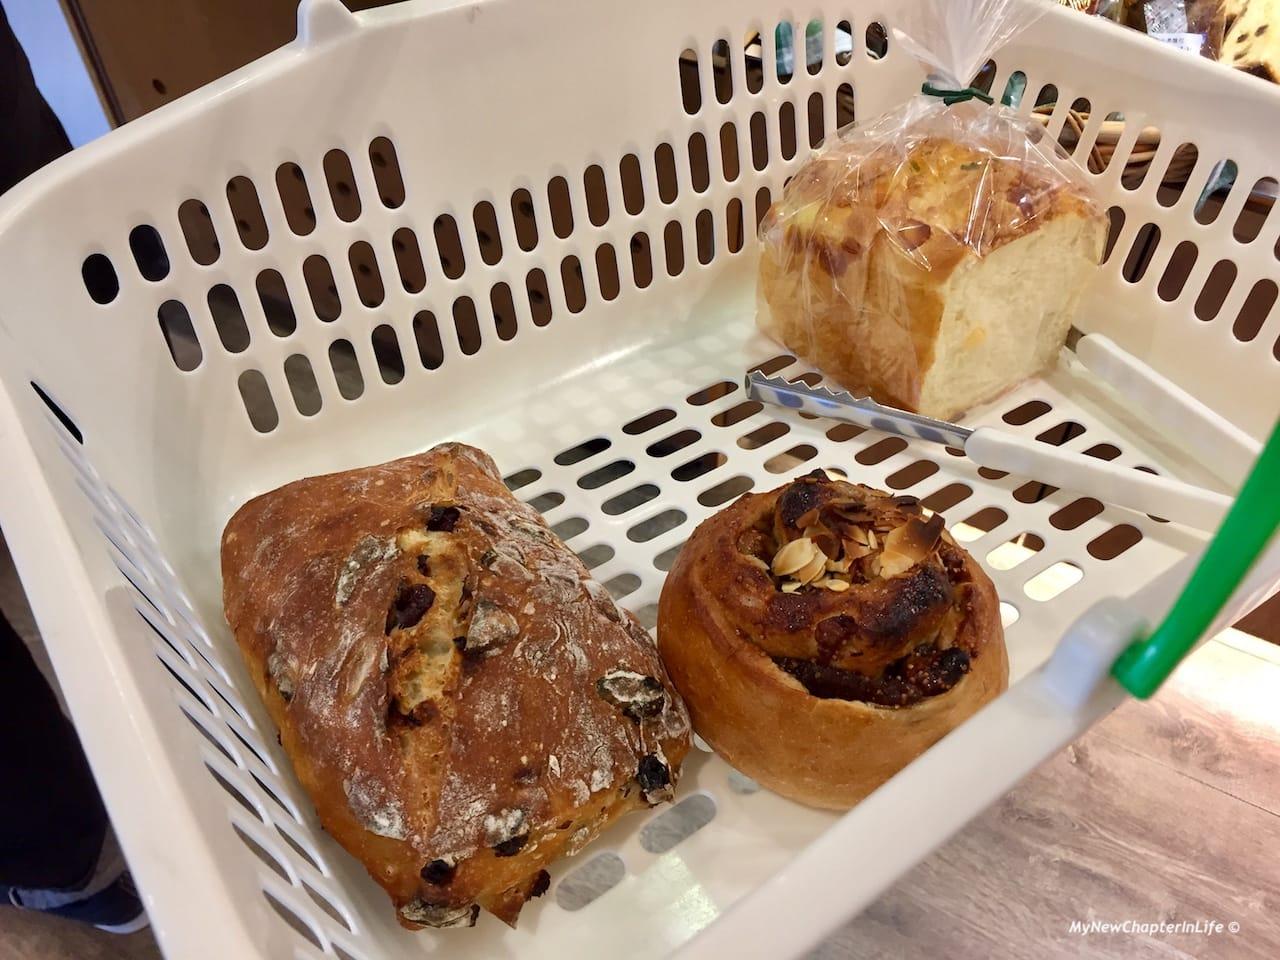 水菓洛斯堤克、核桃無花菓及乳酪吐司 Fruit Restigue, French bread with Fig Walnut and Cheese Toast